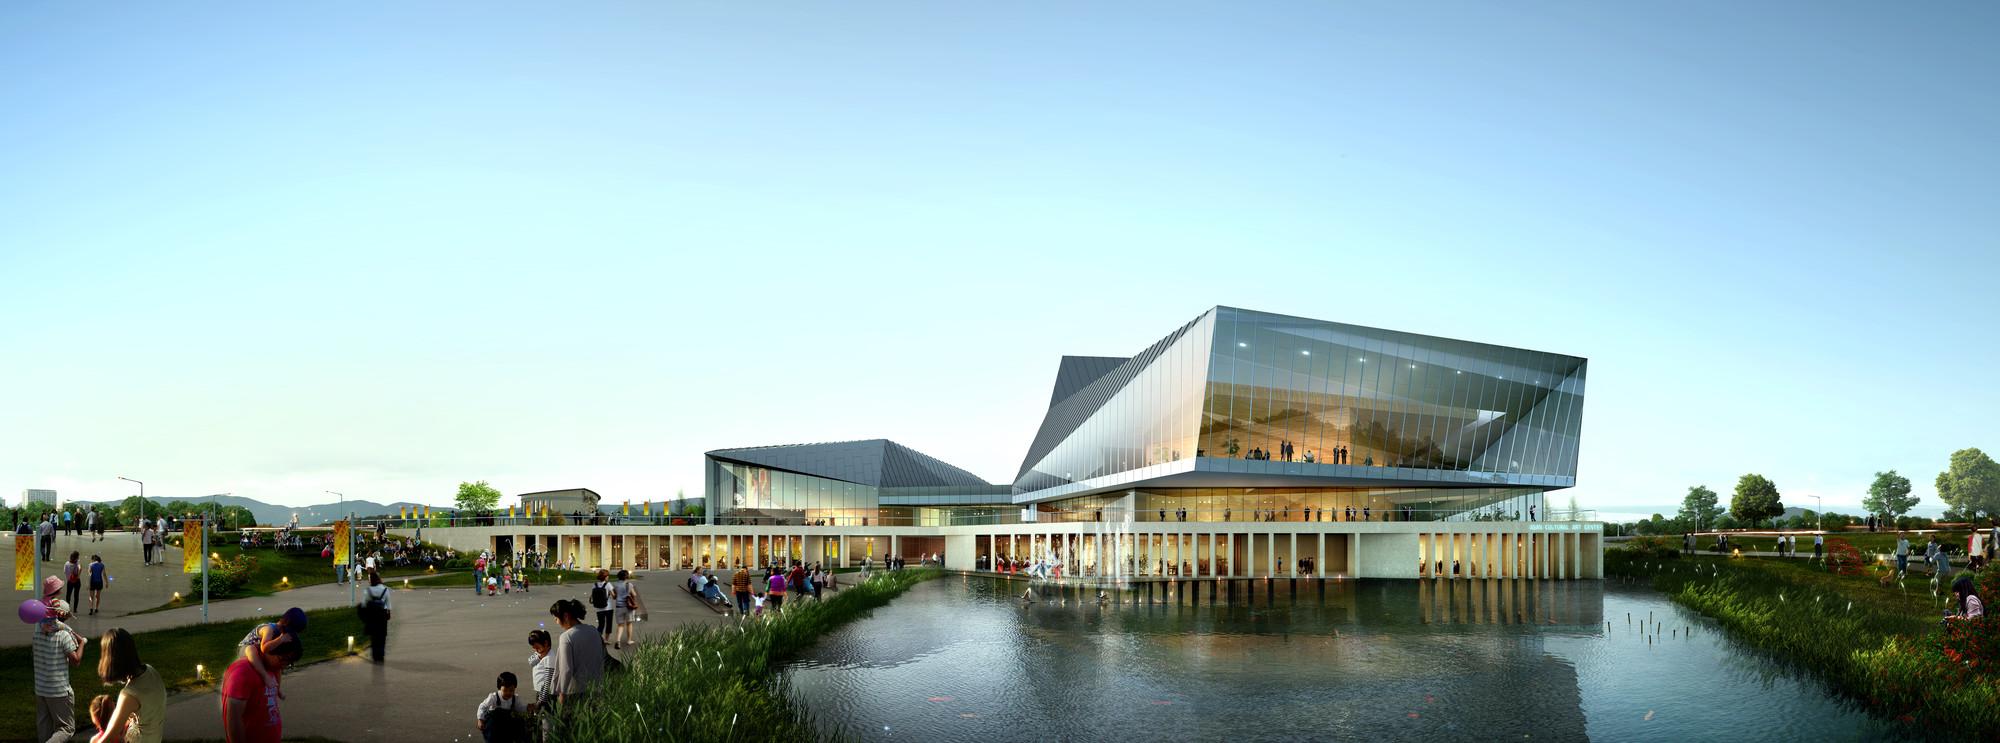 Designcamp Moonpark Dmp Wins Competition For Asan Cultural